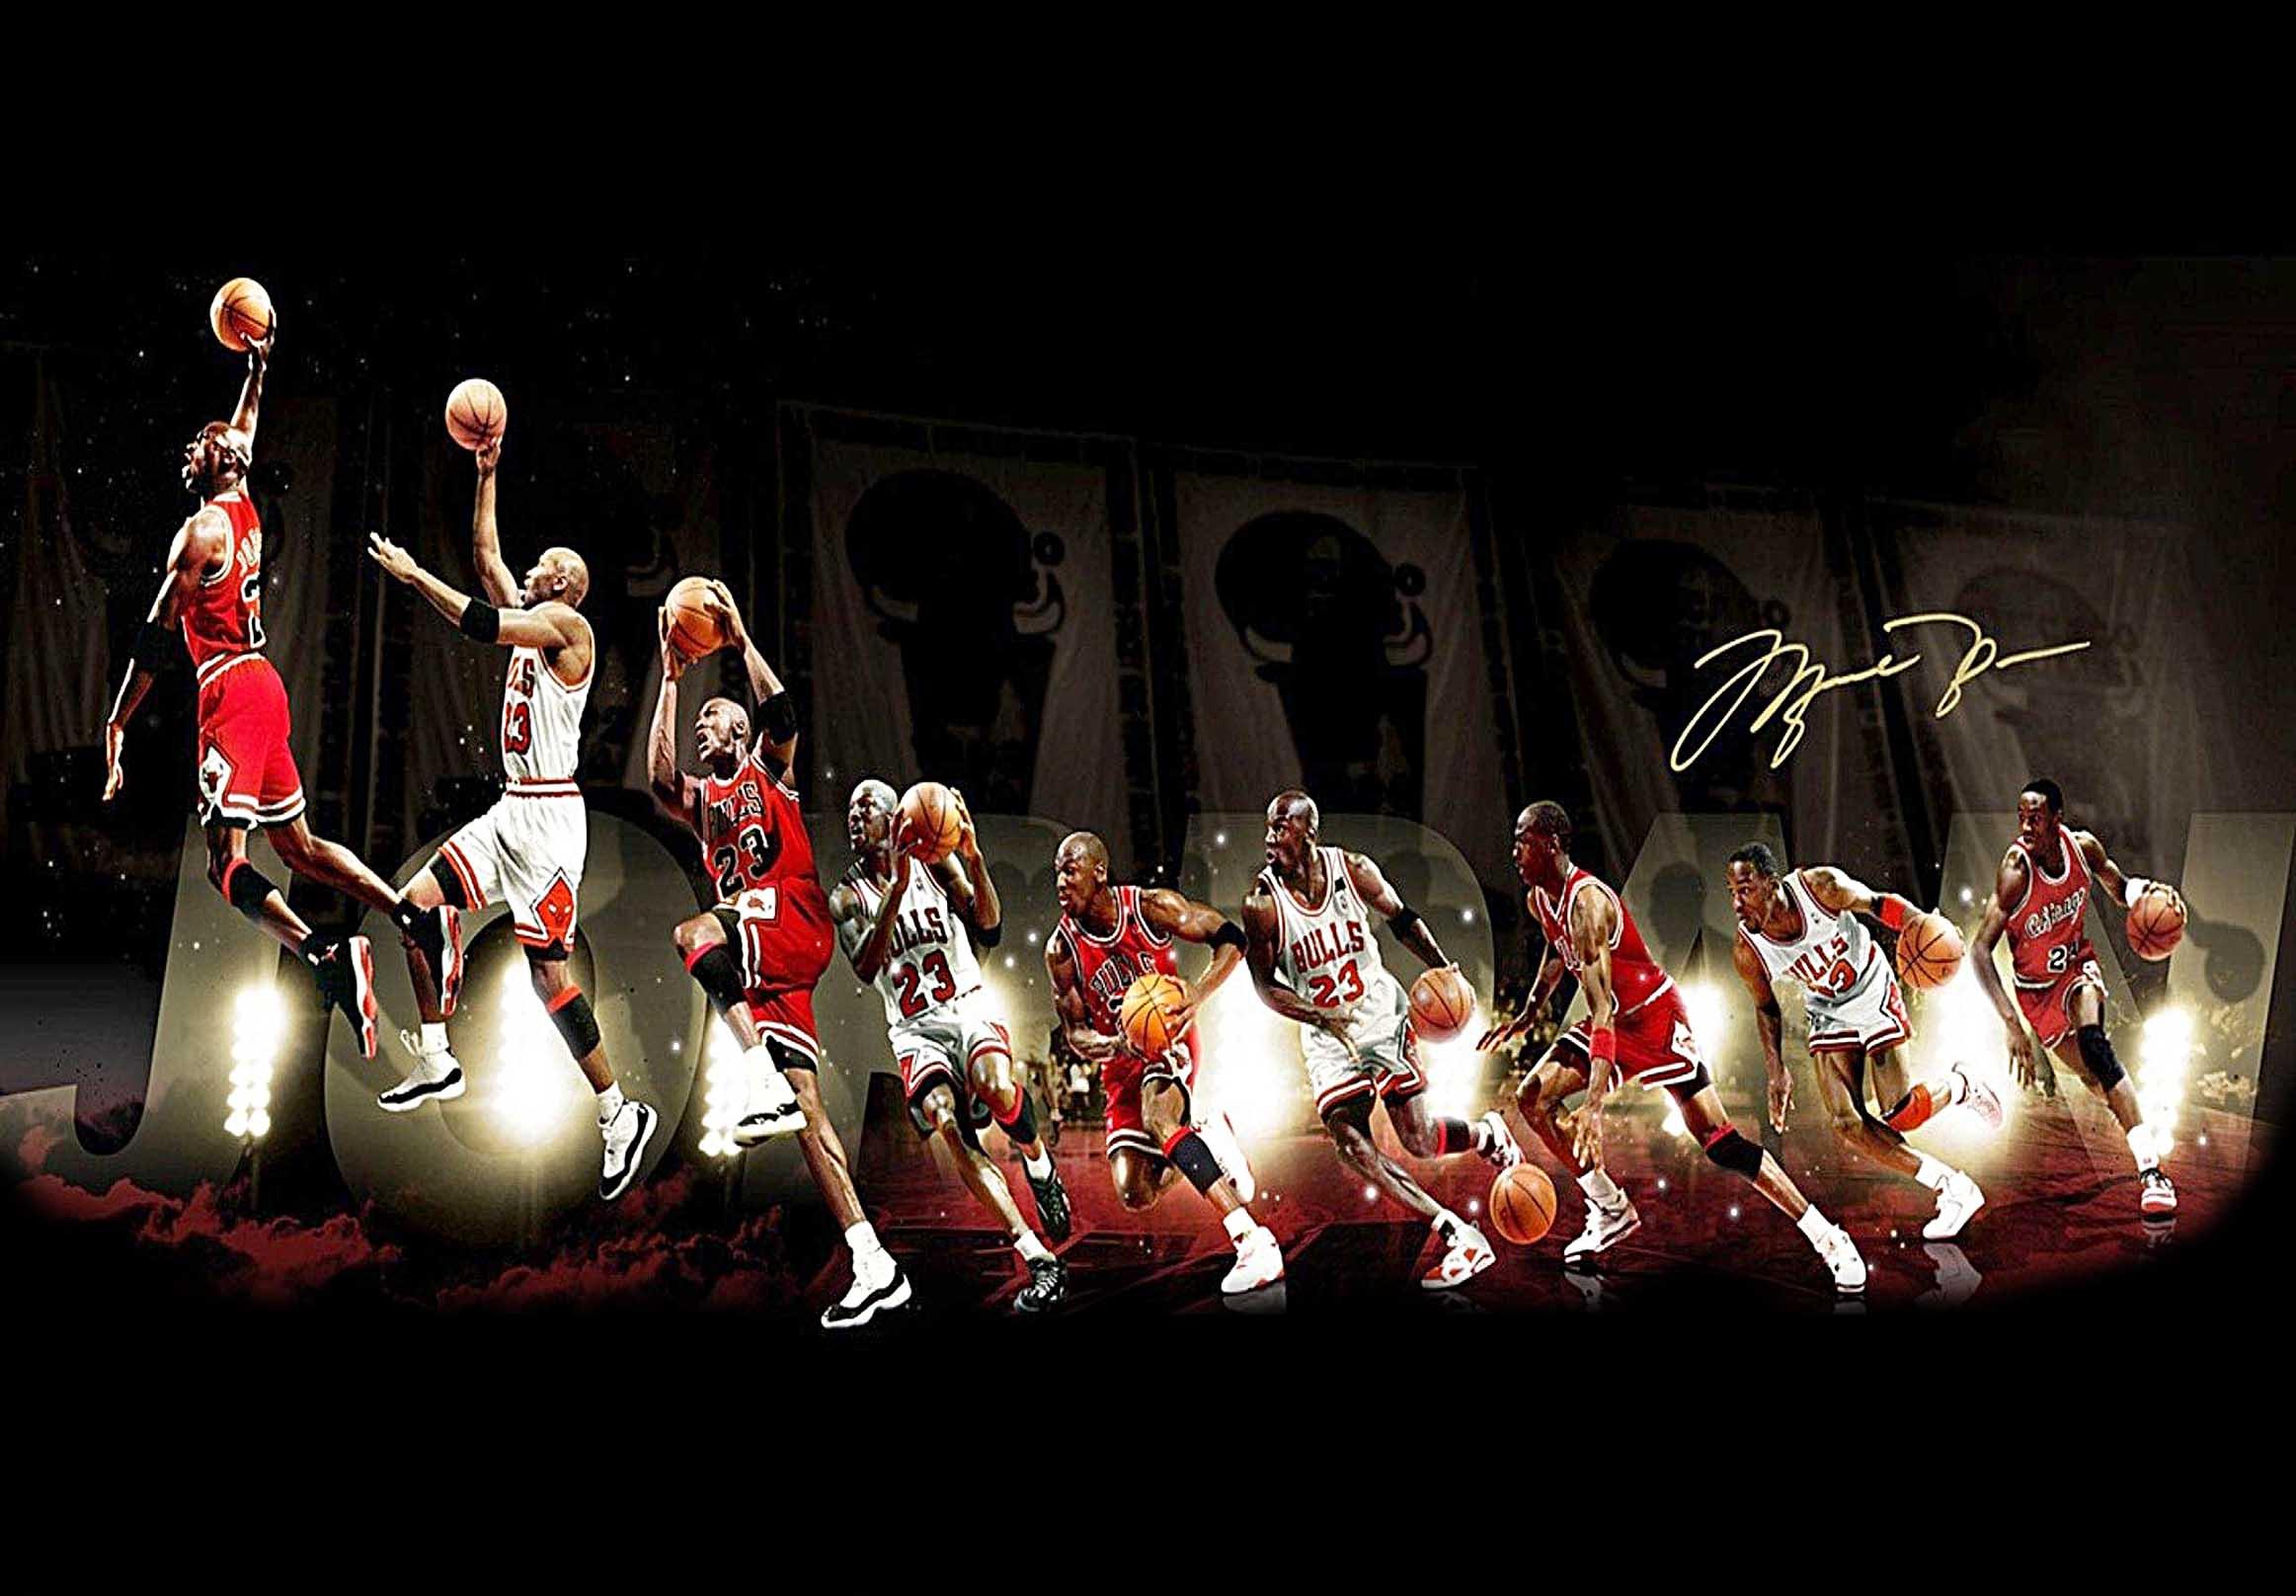 Chicago Bulls Michael Jordan Canvas Tablo (Nba-canvas-jordanmj2)